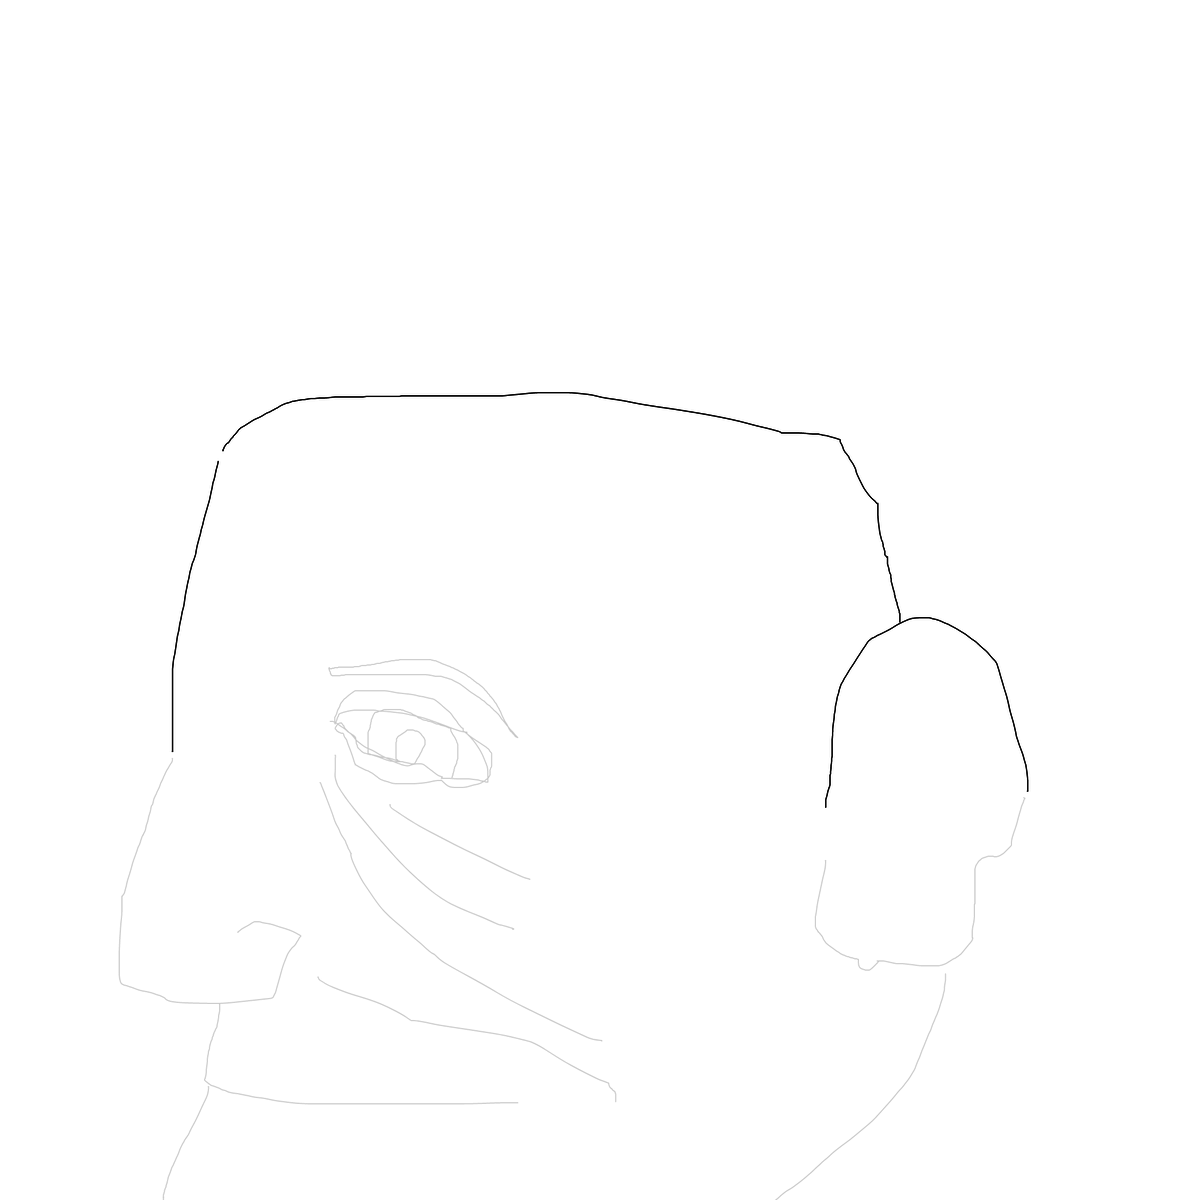 BAAAM drawing#24281 lat:45.6251029968261700lng: -4.2877340316772460